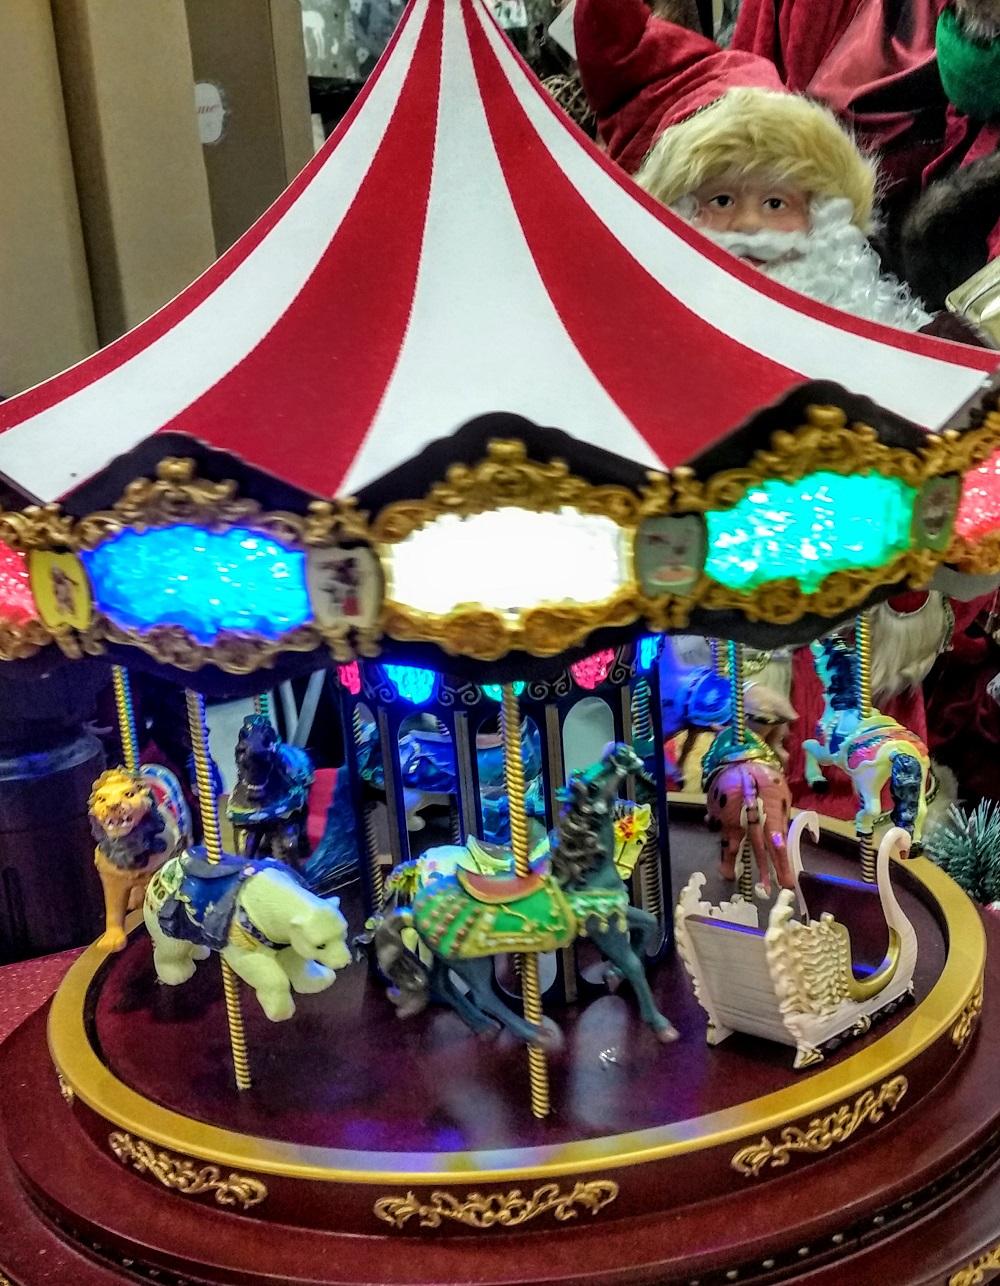 Christmas Carousel Recreation 2020 Old Neko: Christmas Carousel at Dillards